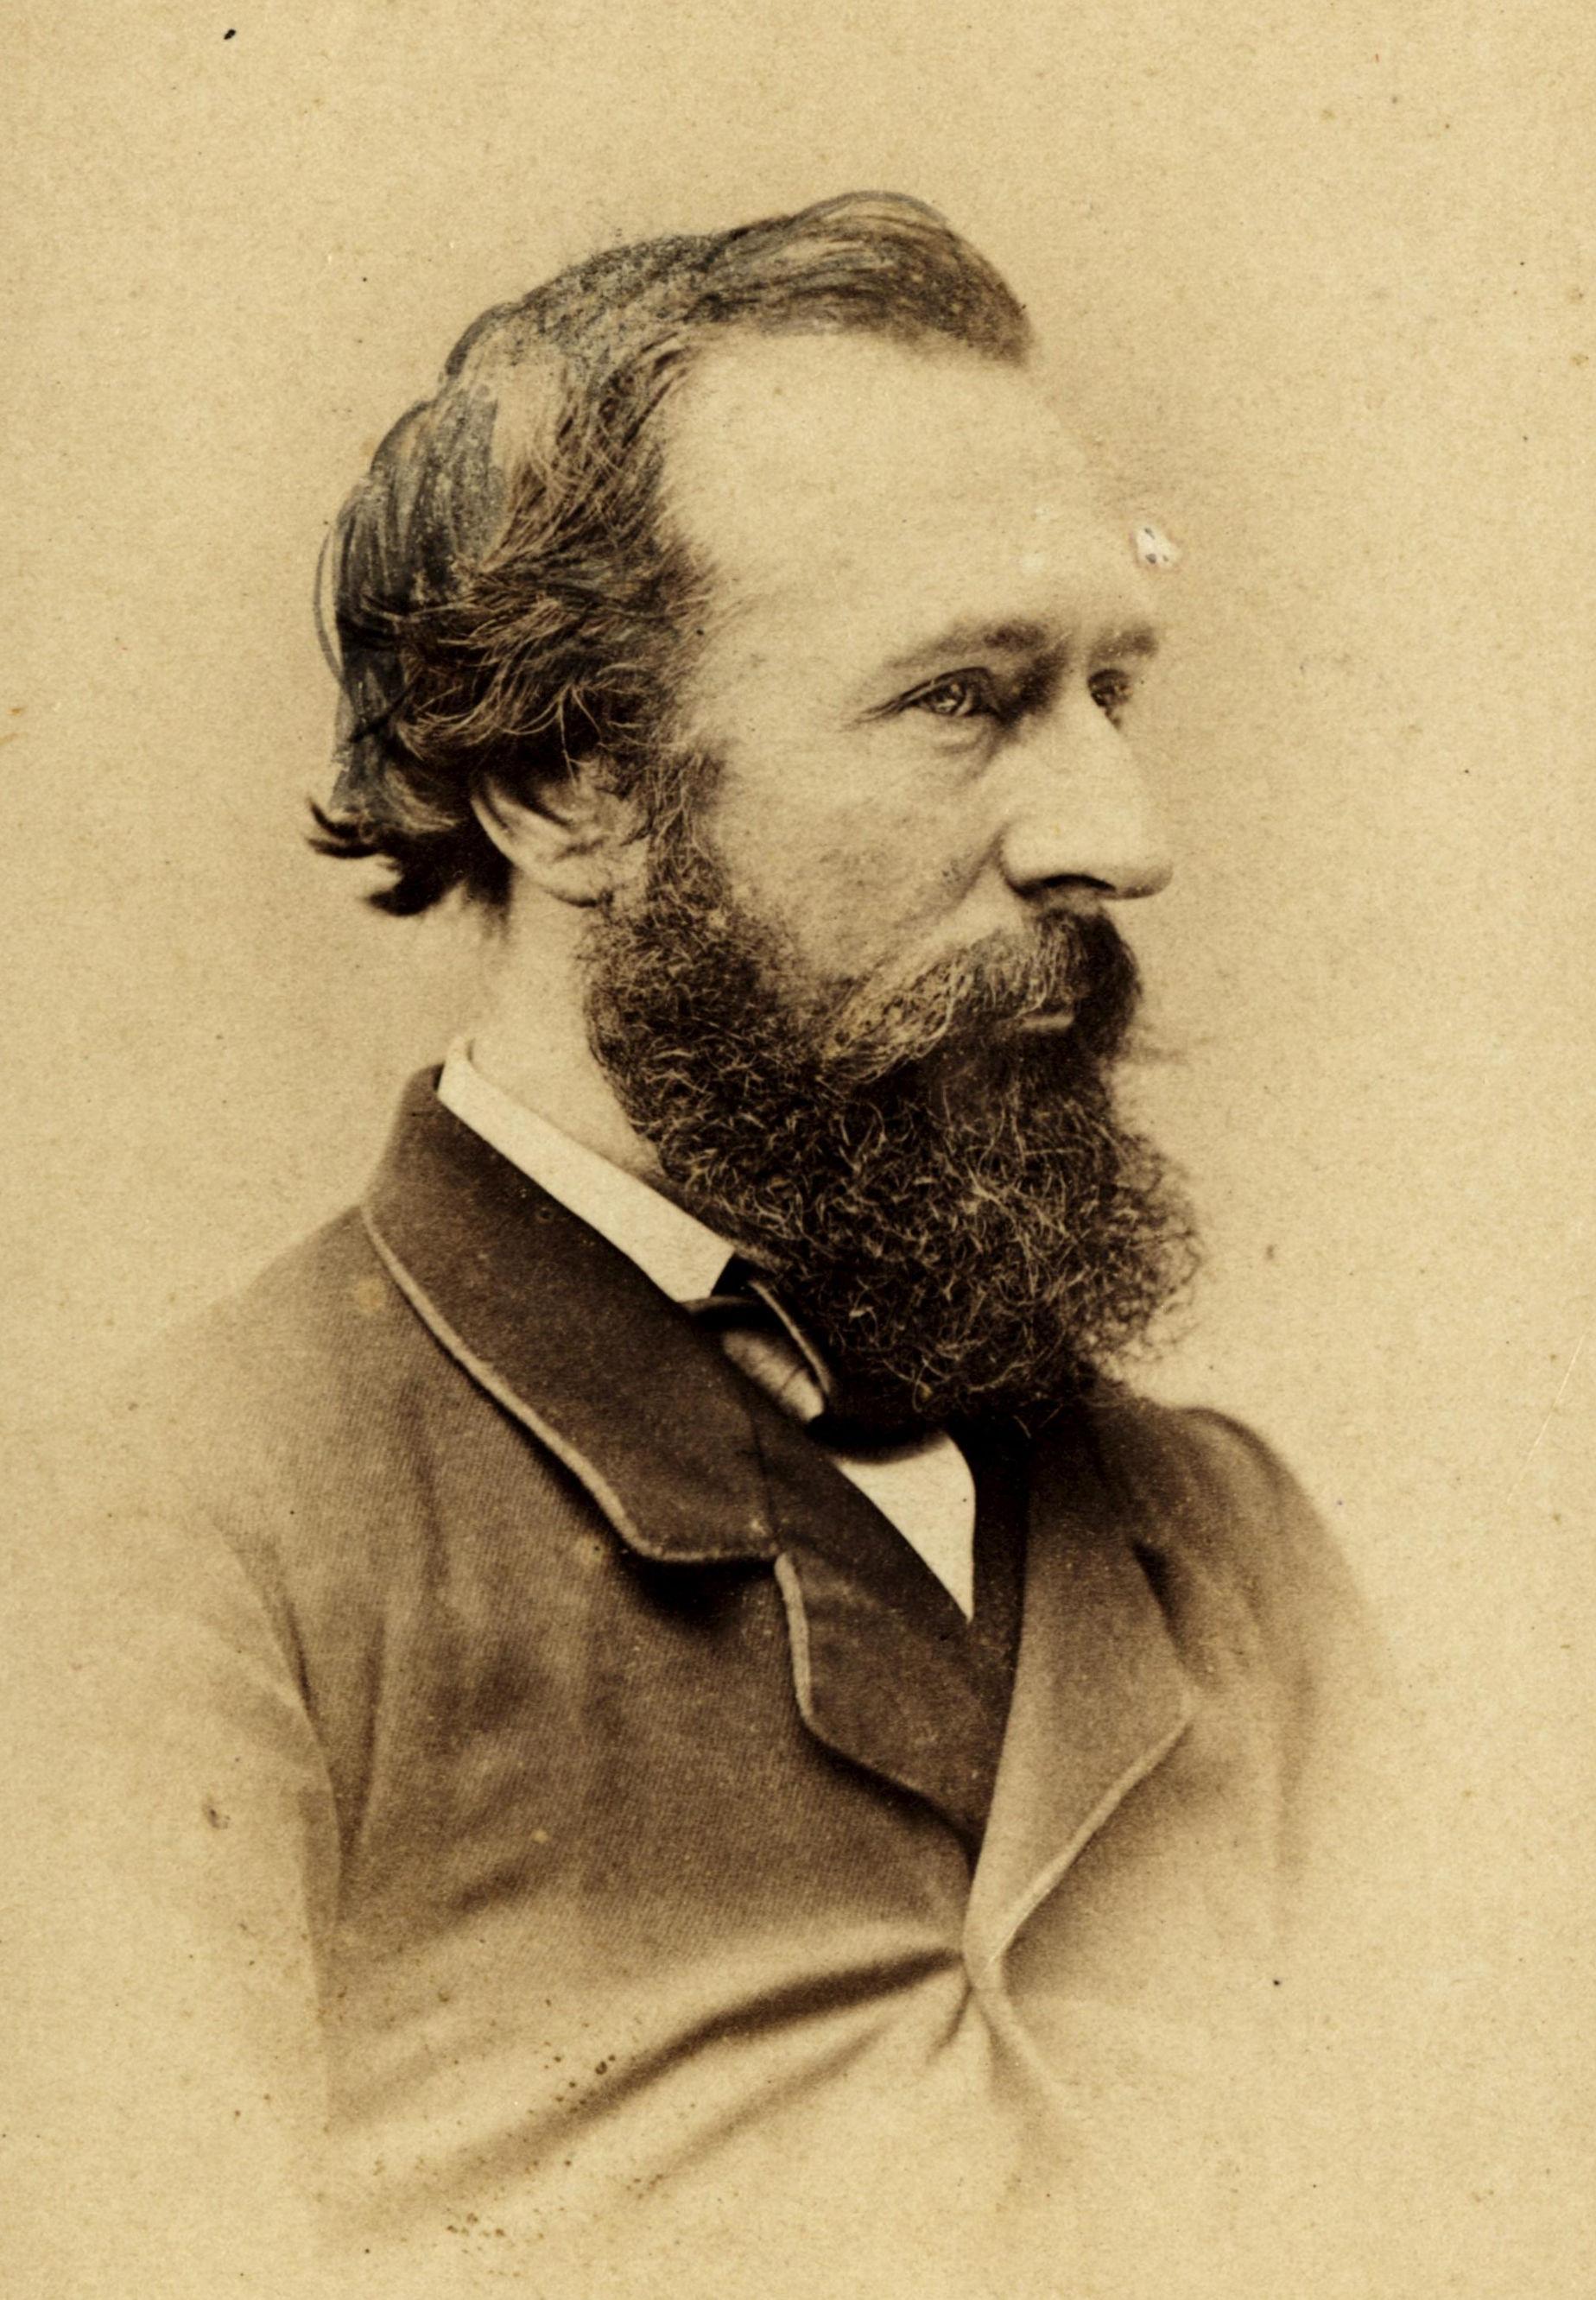 FilePortretfoto Detail Carte De Visite Van JH Egenberger Uit 1868